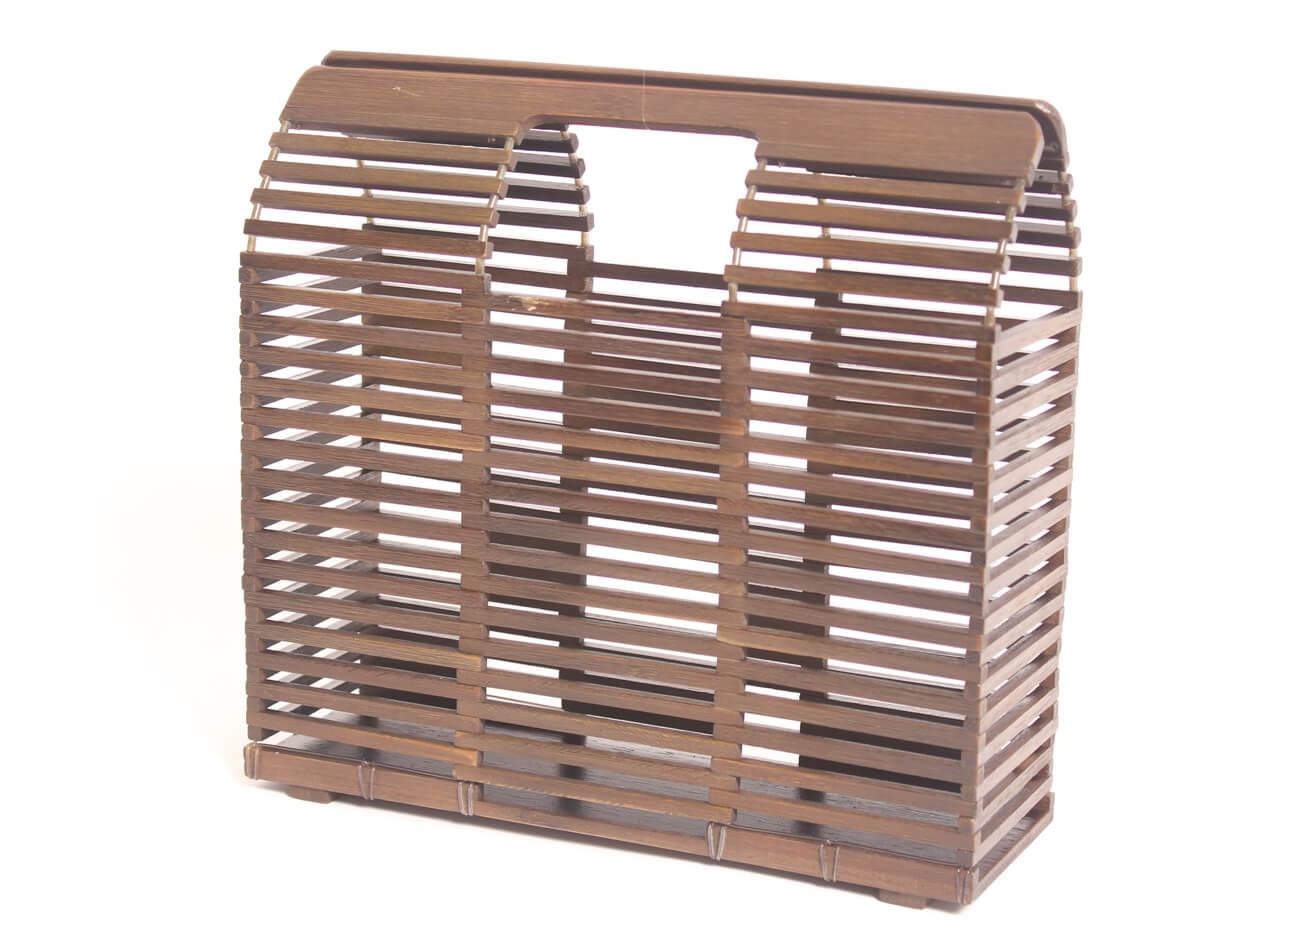 Bolso de bambu cuadrado (8)